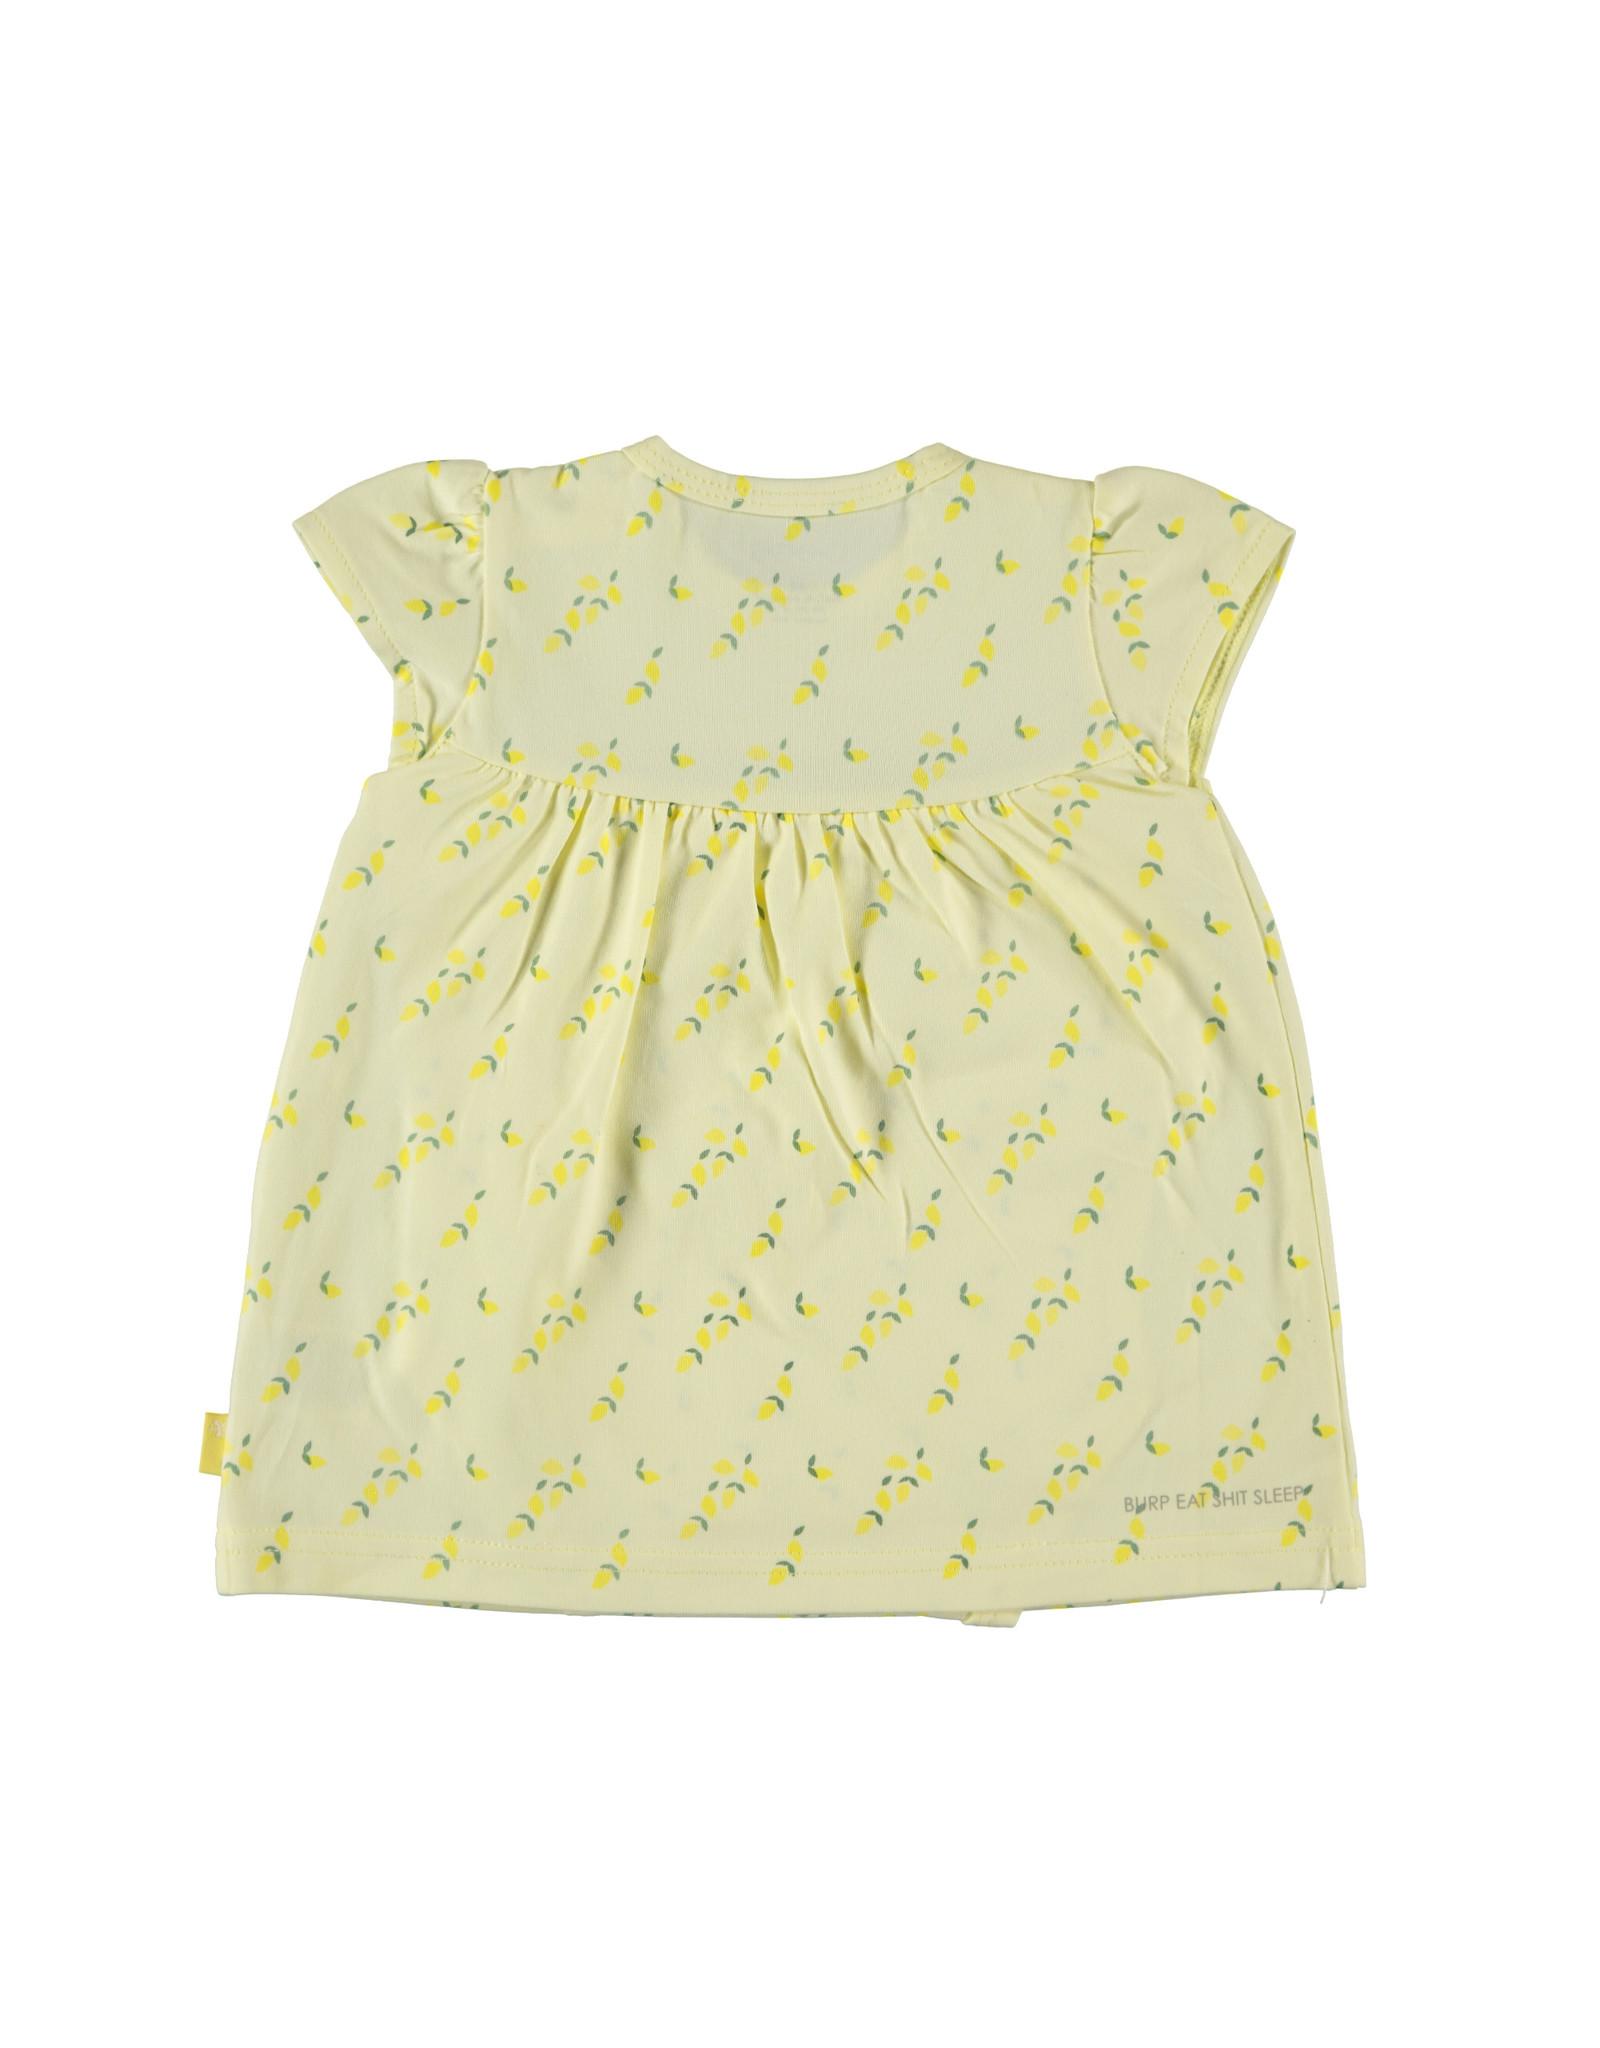 B.E.S.S. Dress romper AOP Lemons, Yellow